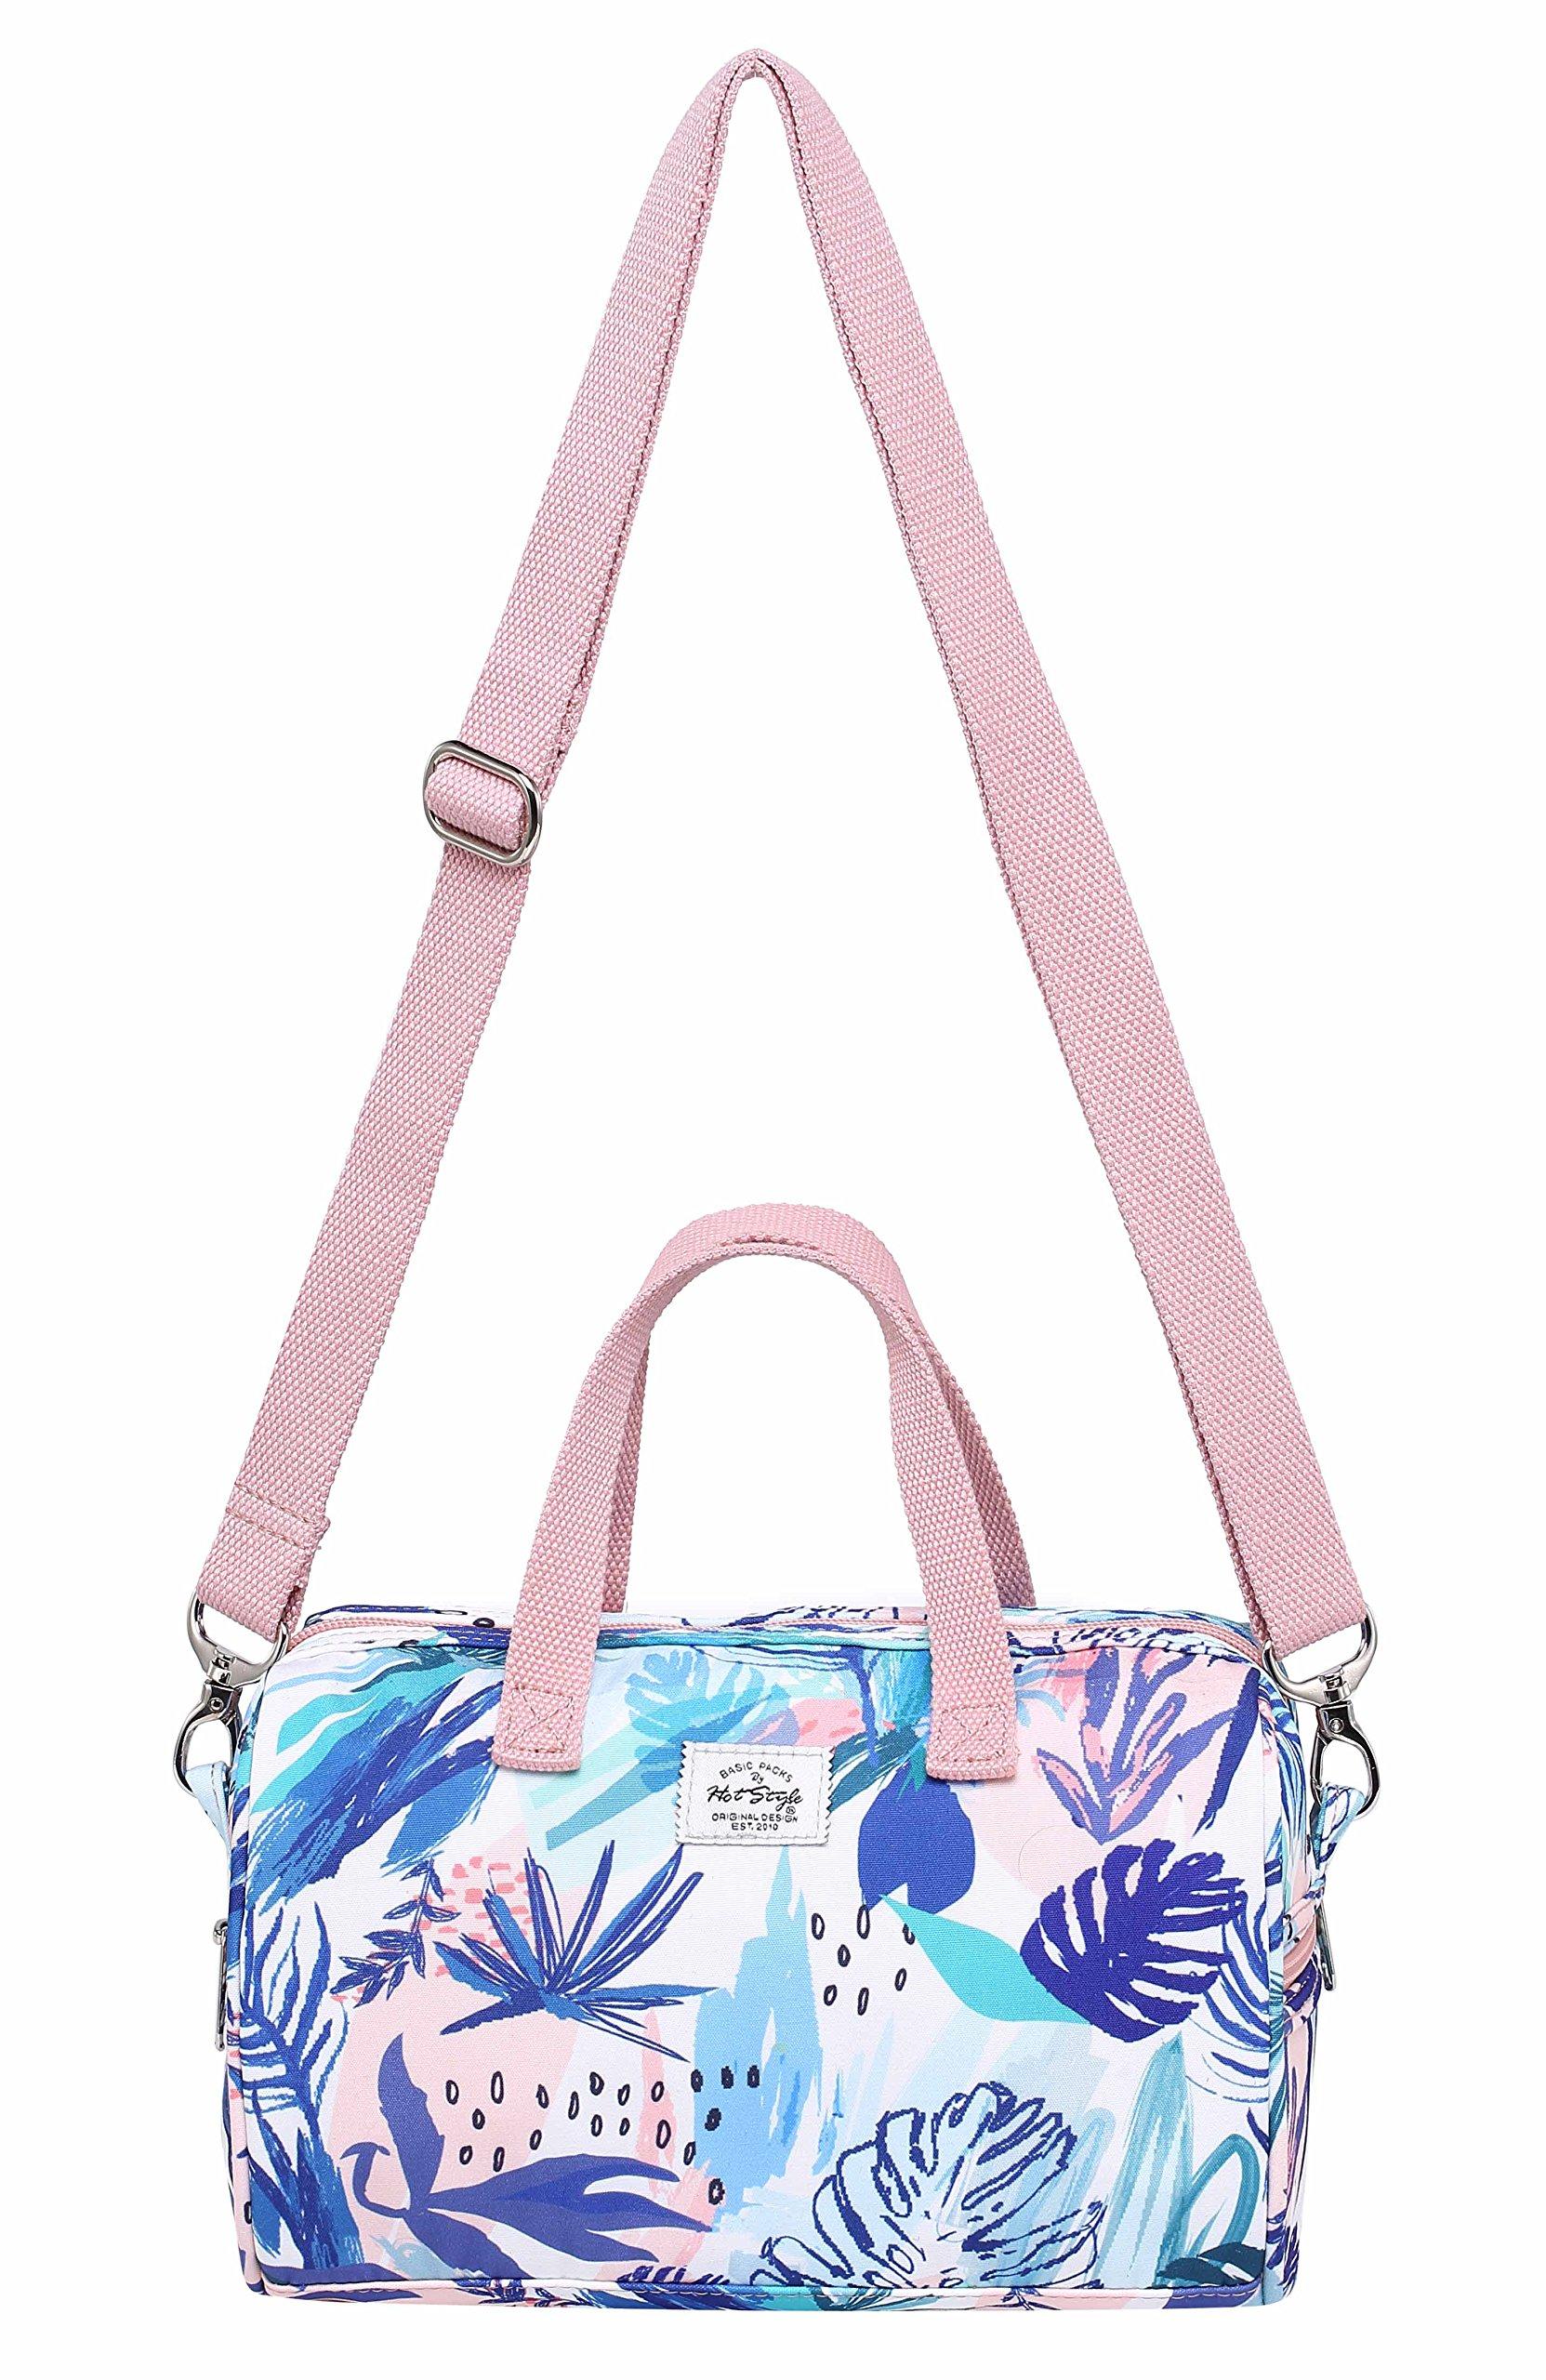 MIETTE Girls Mini Crossbody Shoulder Bag Small Handbag | 9.4''x6.2''x4.7'' | Floral, Pink